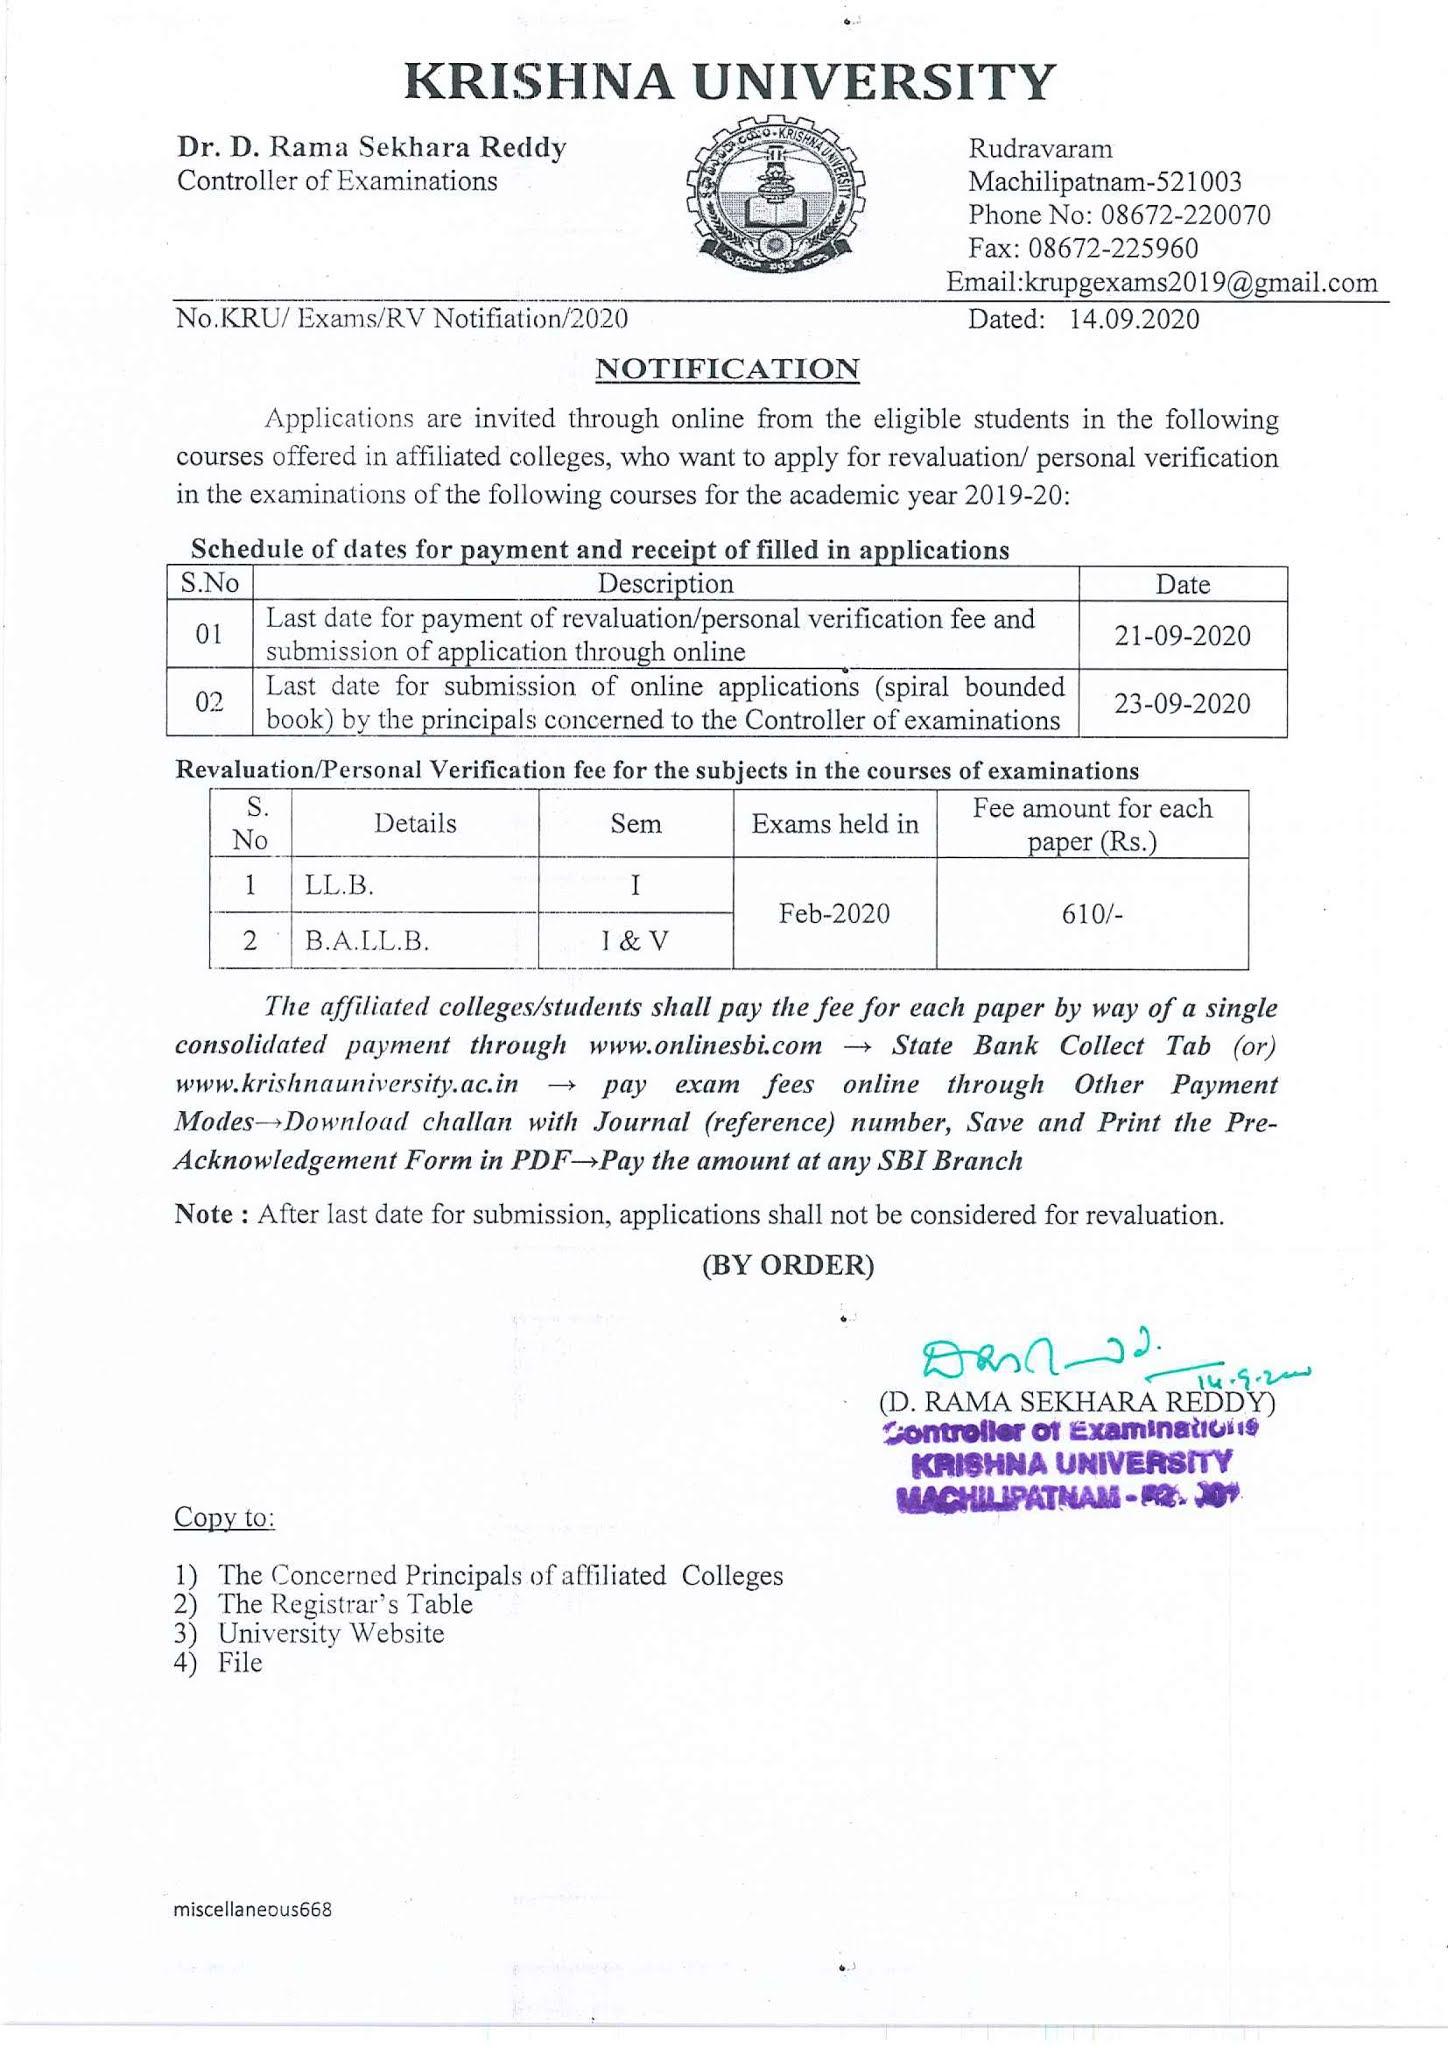 Krishna University LLB I Sem and BA.LLB I & V Sem Feb-2020 Revaluation Exam Notification